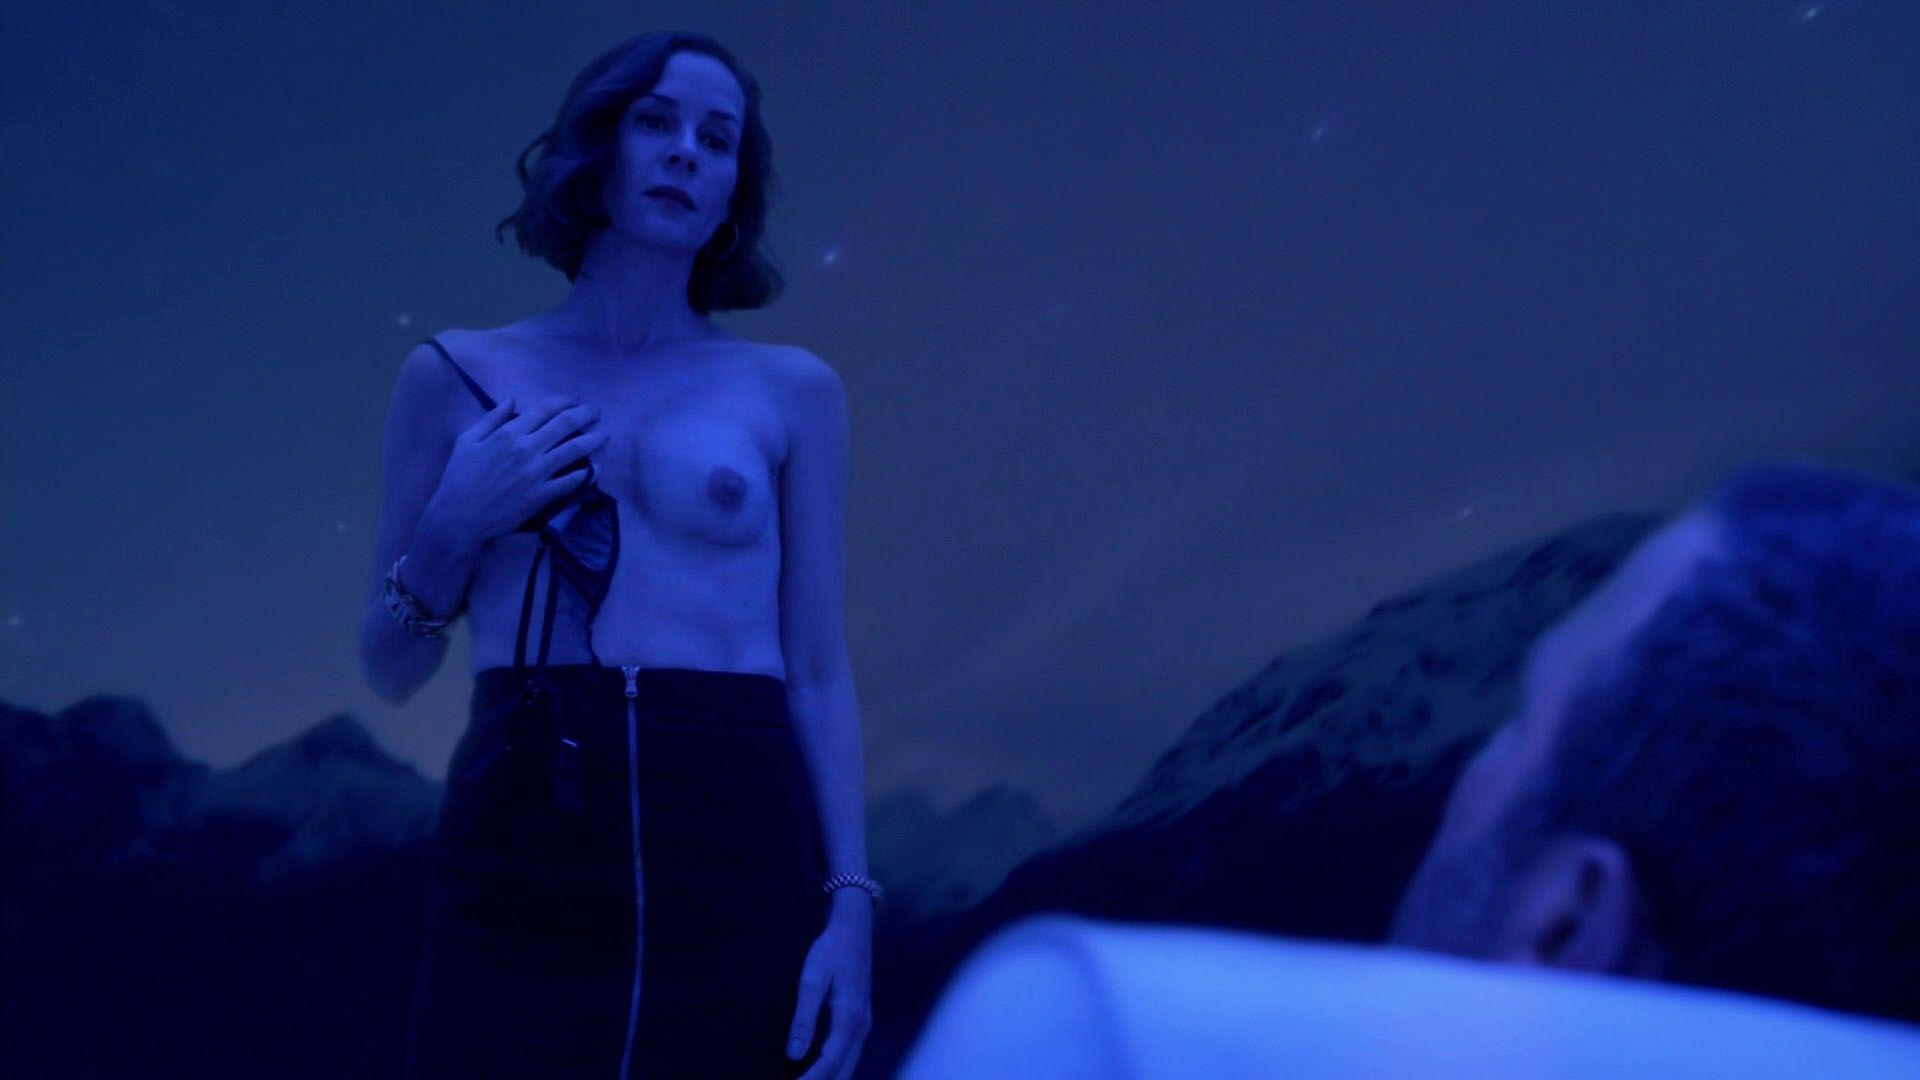 Embeth Davidtz nude photos